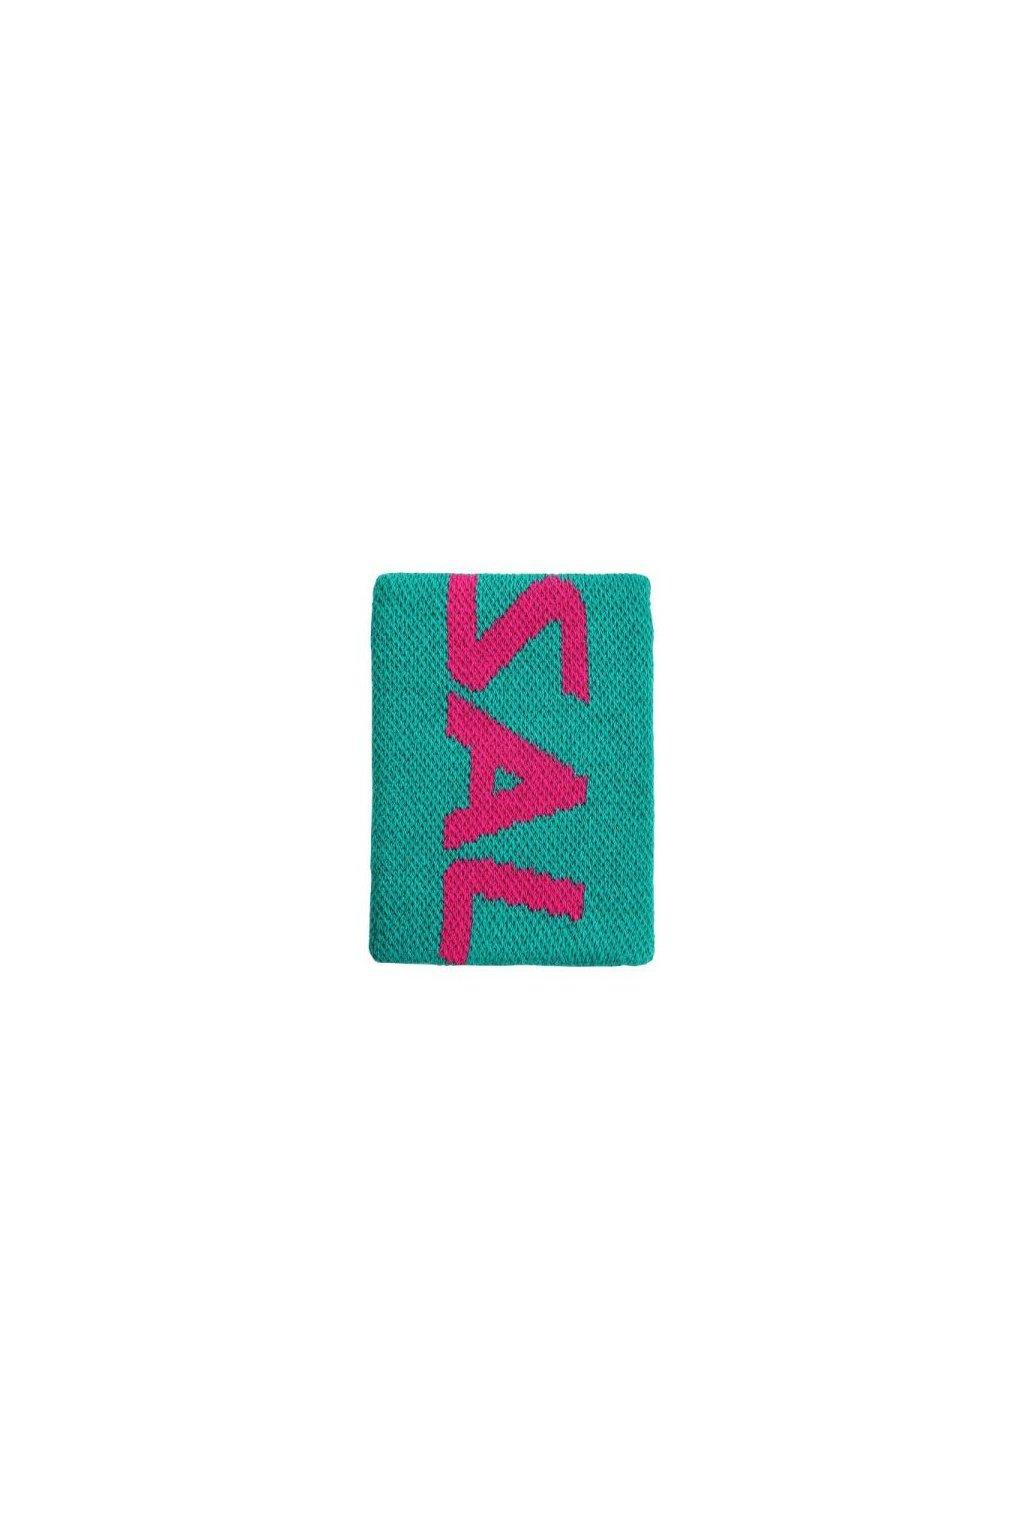 salming wristband mid ceramic green azalea pink